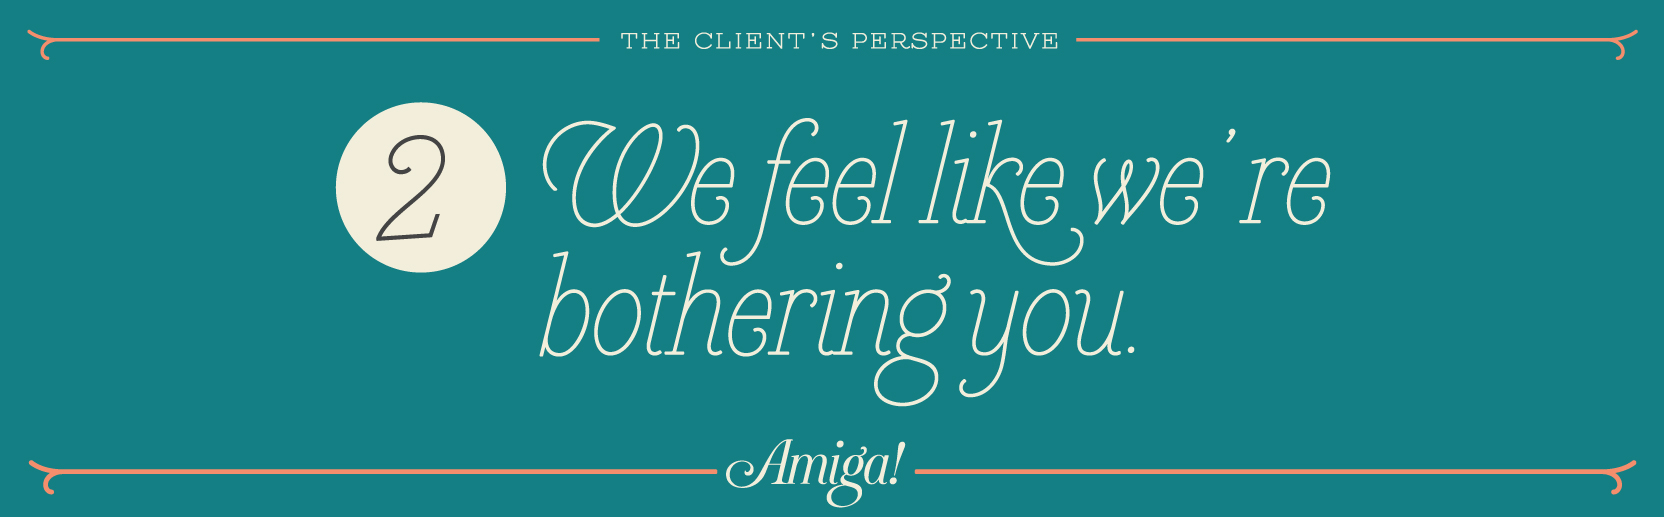 Amiga_clientPerspective_working2.jpg